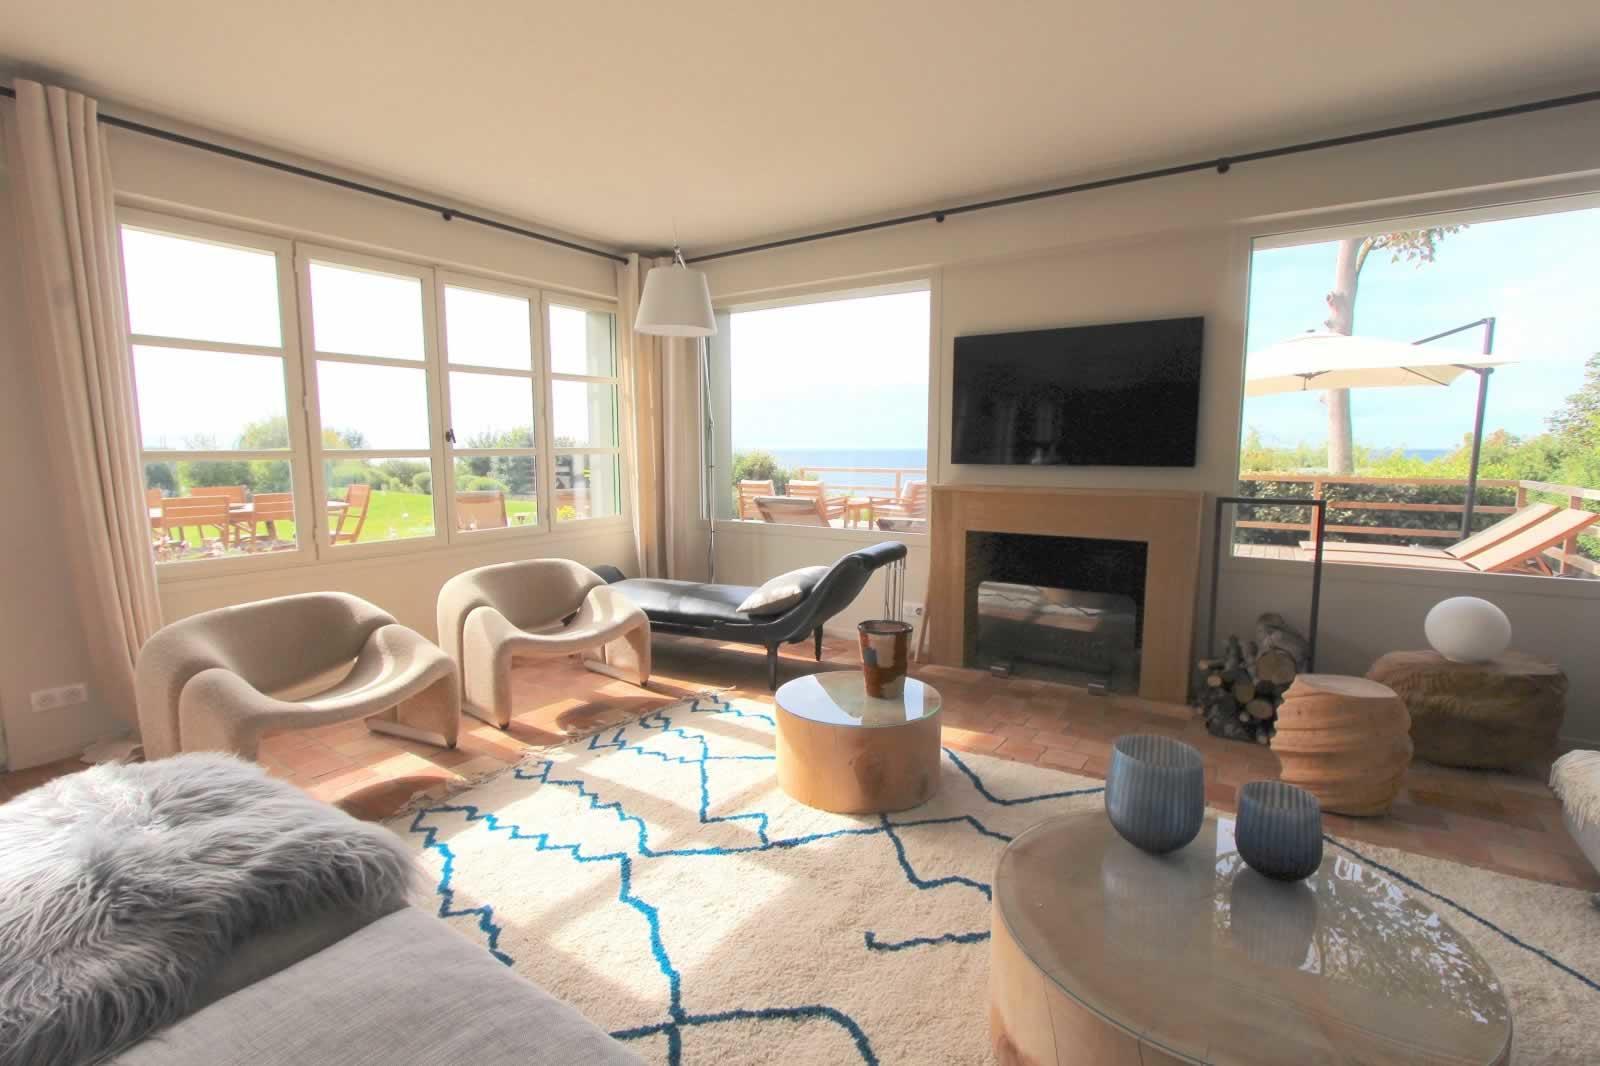 belle-villa-normande-a-louer-benerville-sur-mer-cheminee-vaste-terrasse-court-tennis